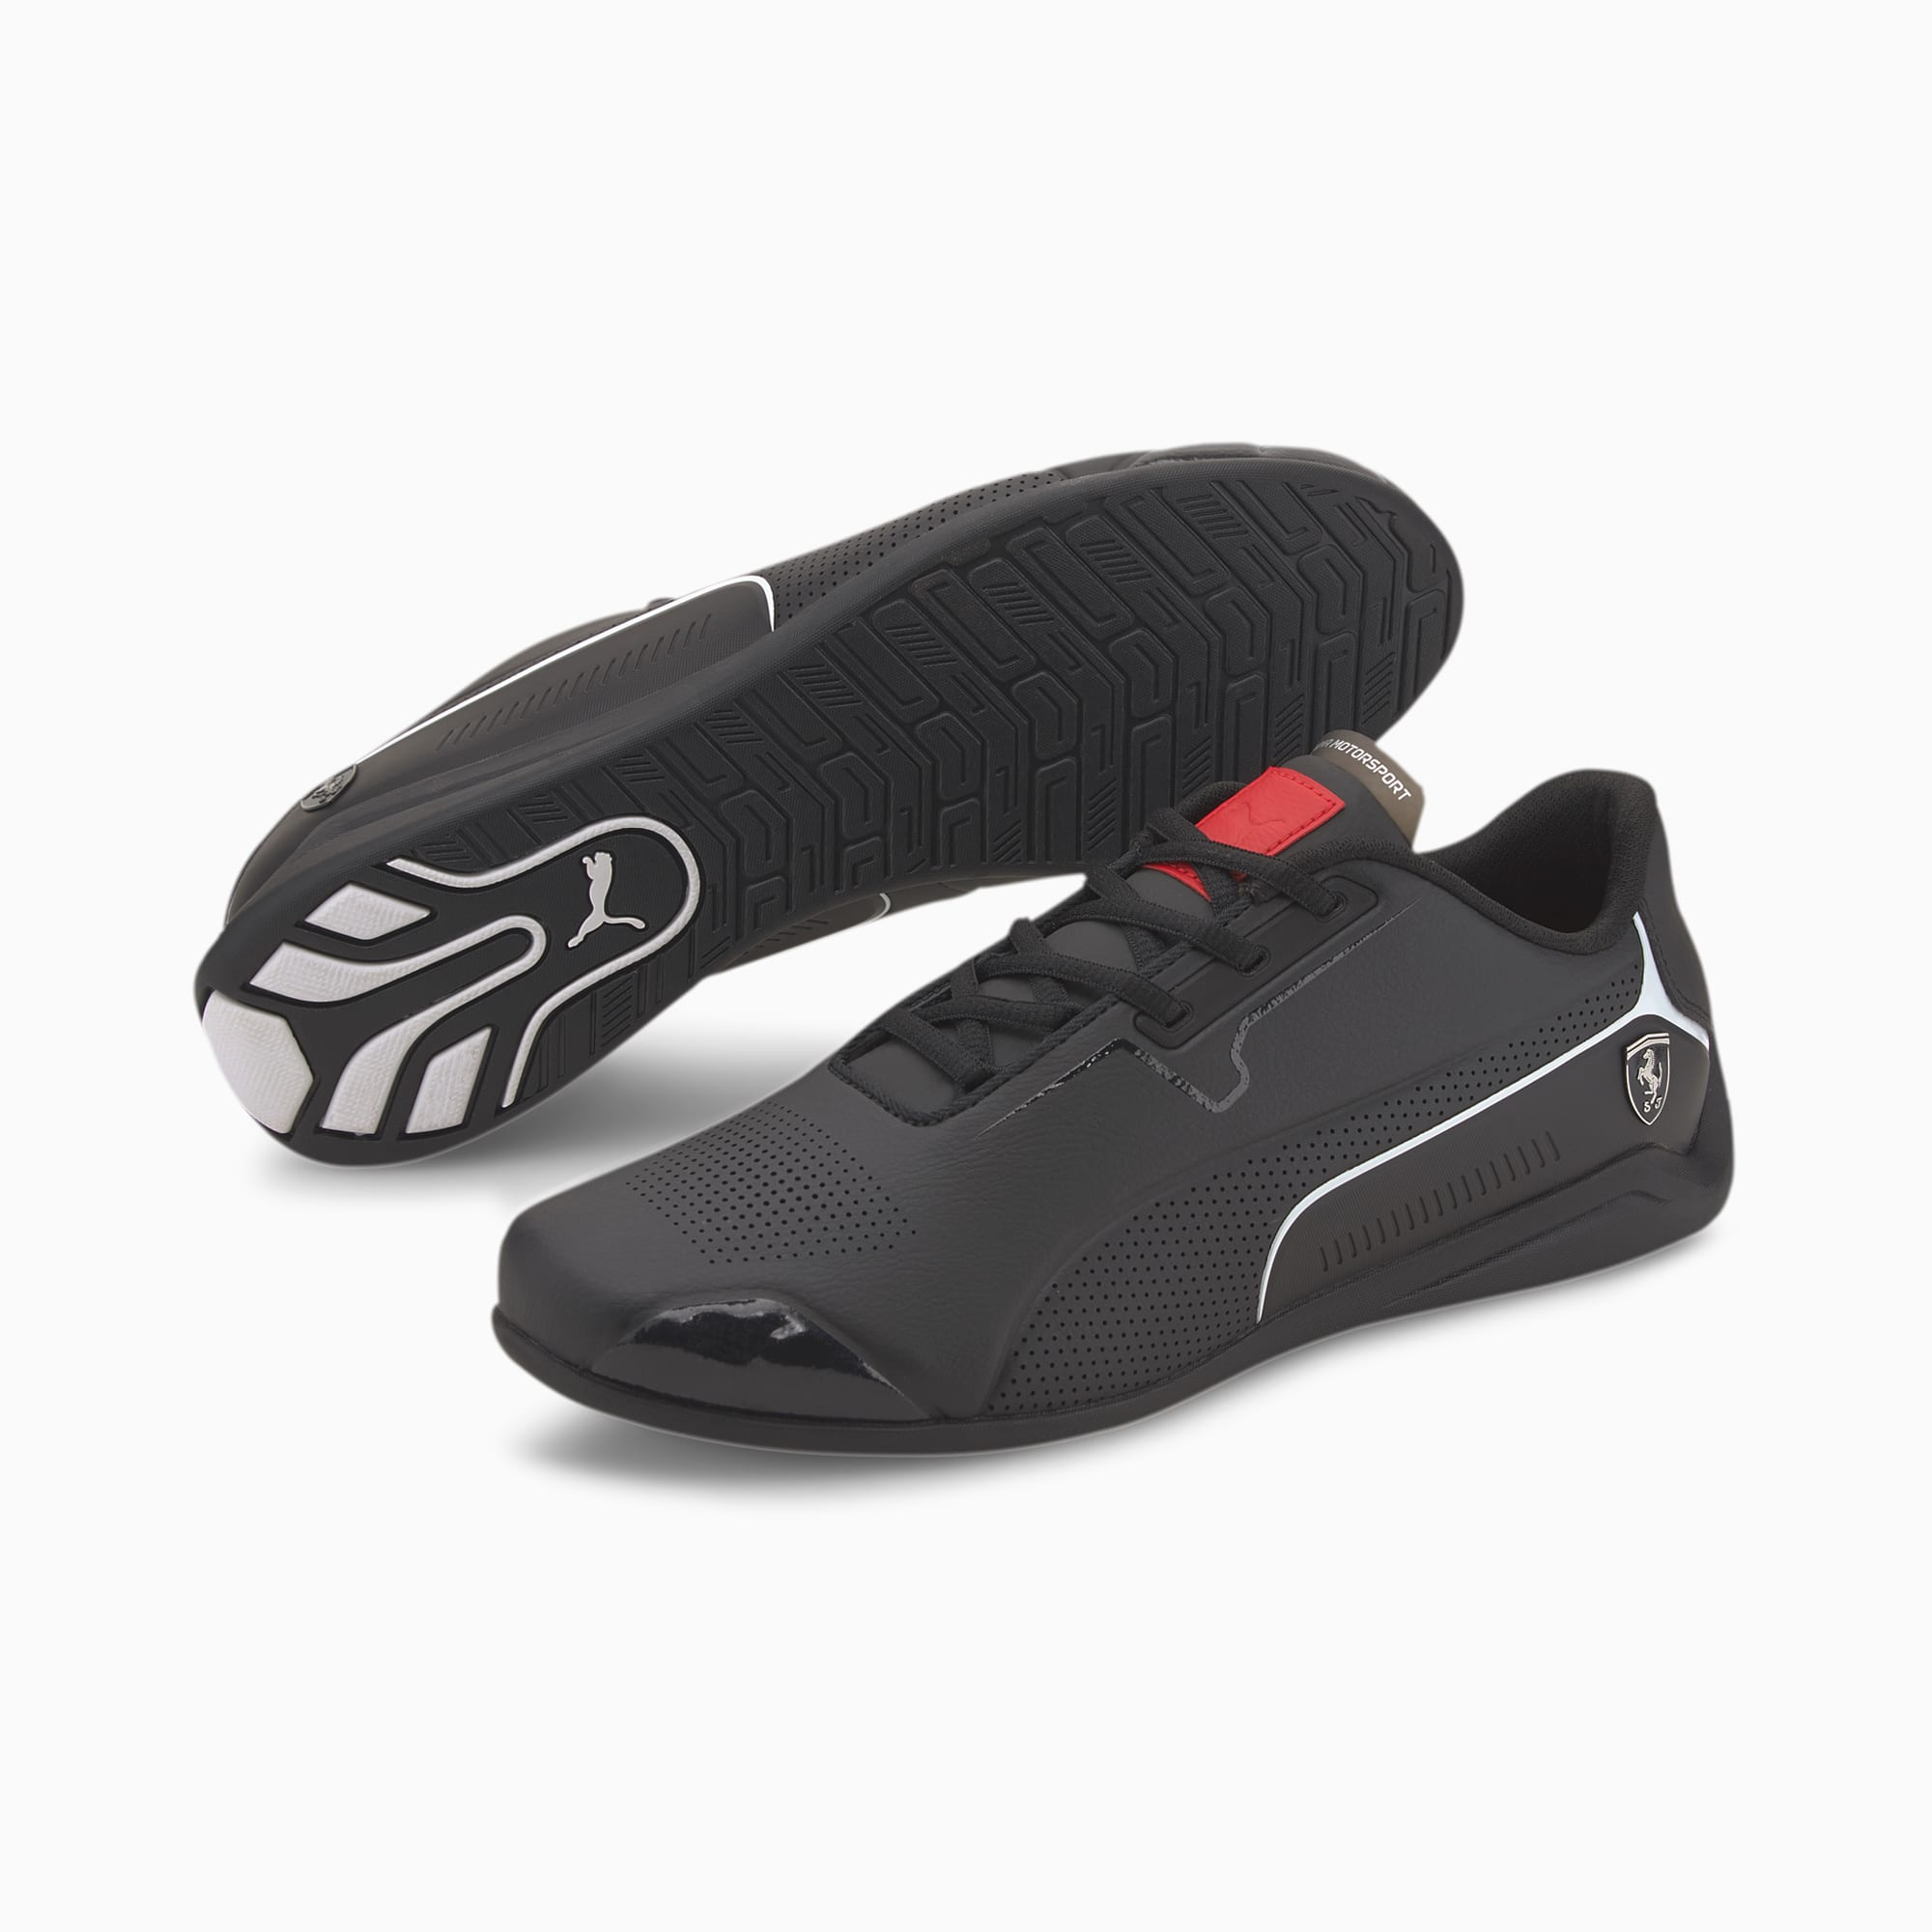 Scuderia Ferrari Drift Cat 8 Shoes